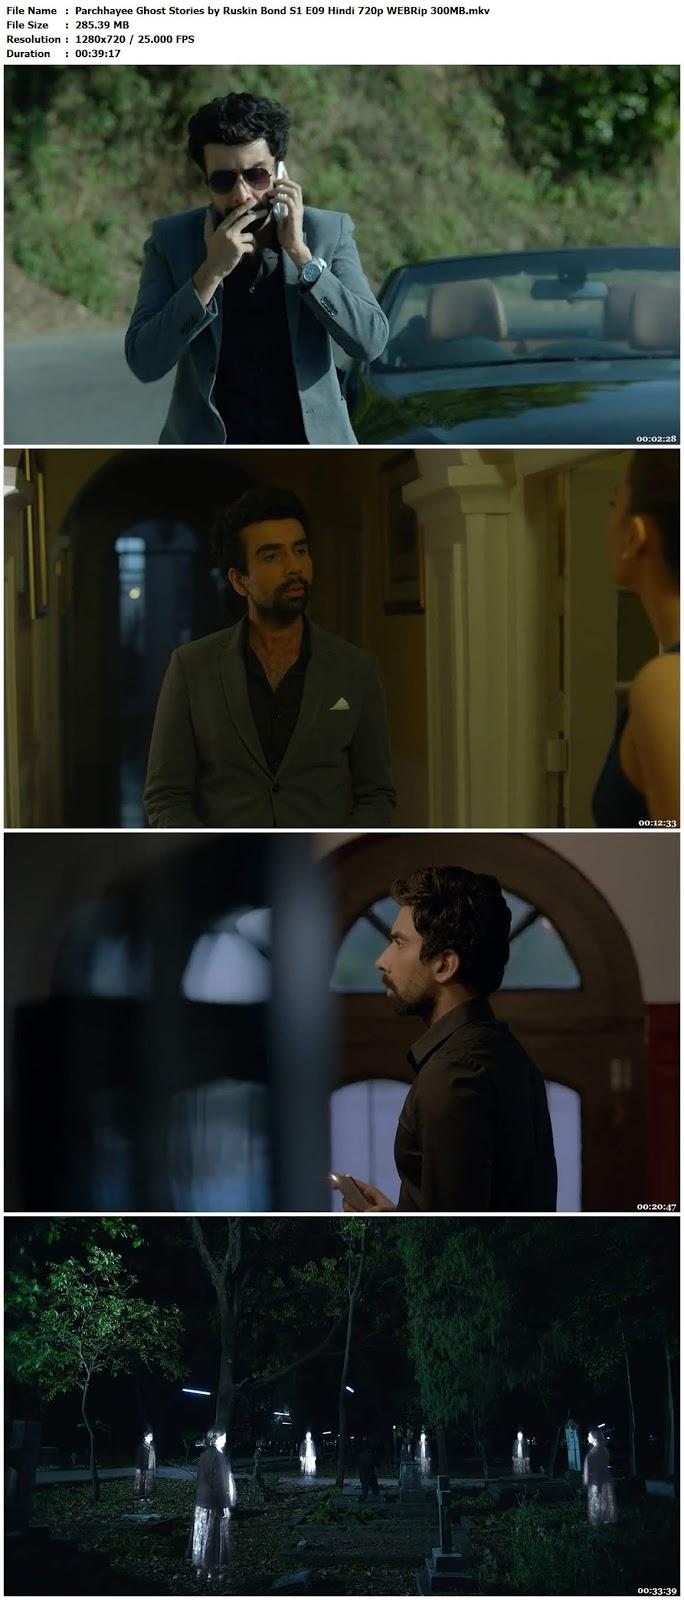 Parchayee Ghost Stories by Ruskin Bond S1 [Episode 9] Hindi 480p WEBRip 110MB Desirehub